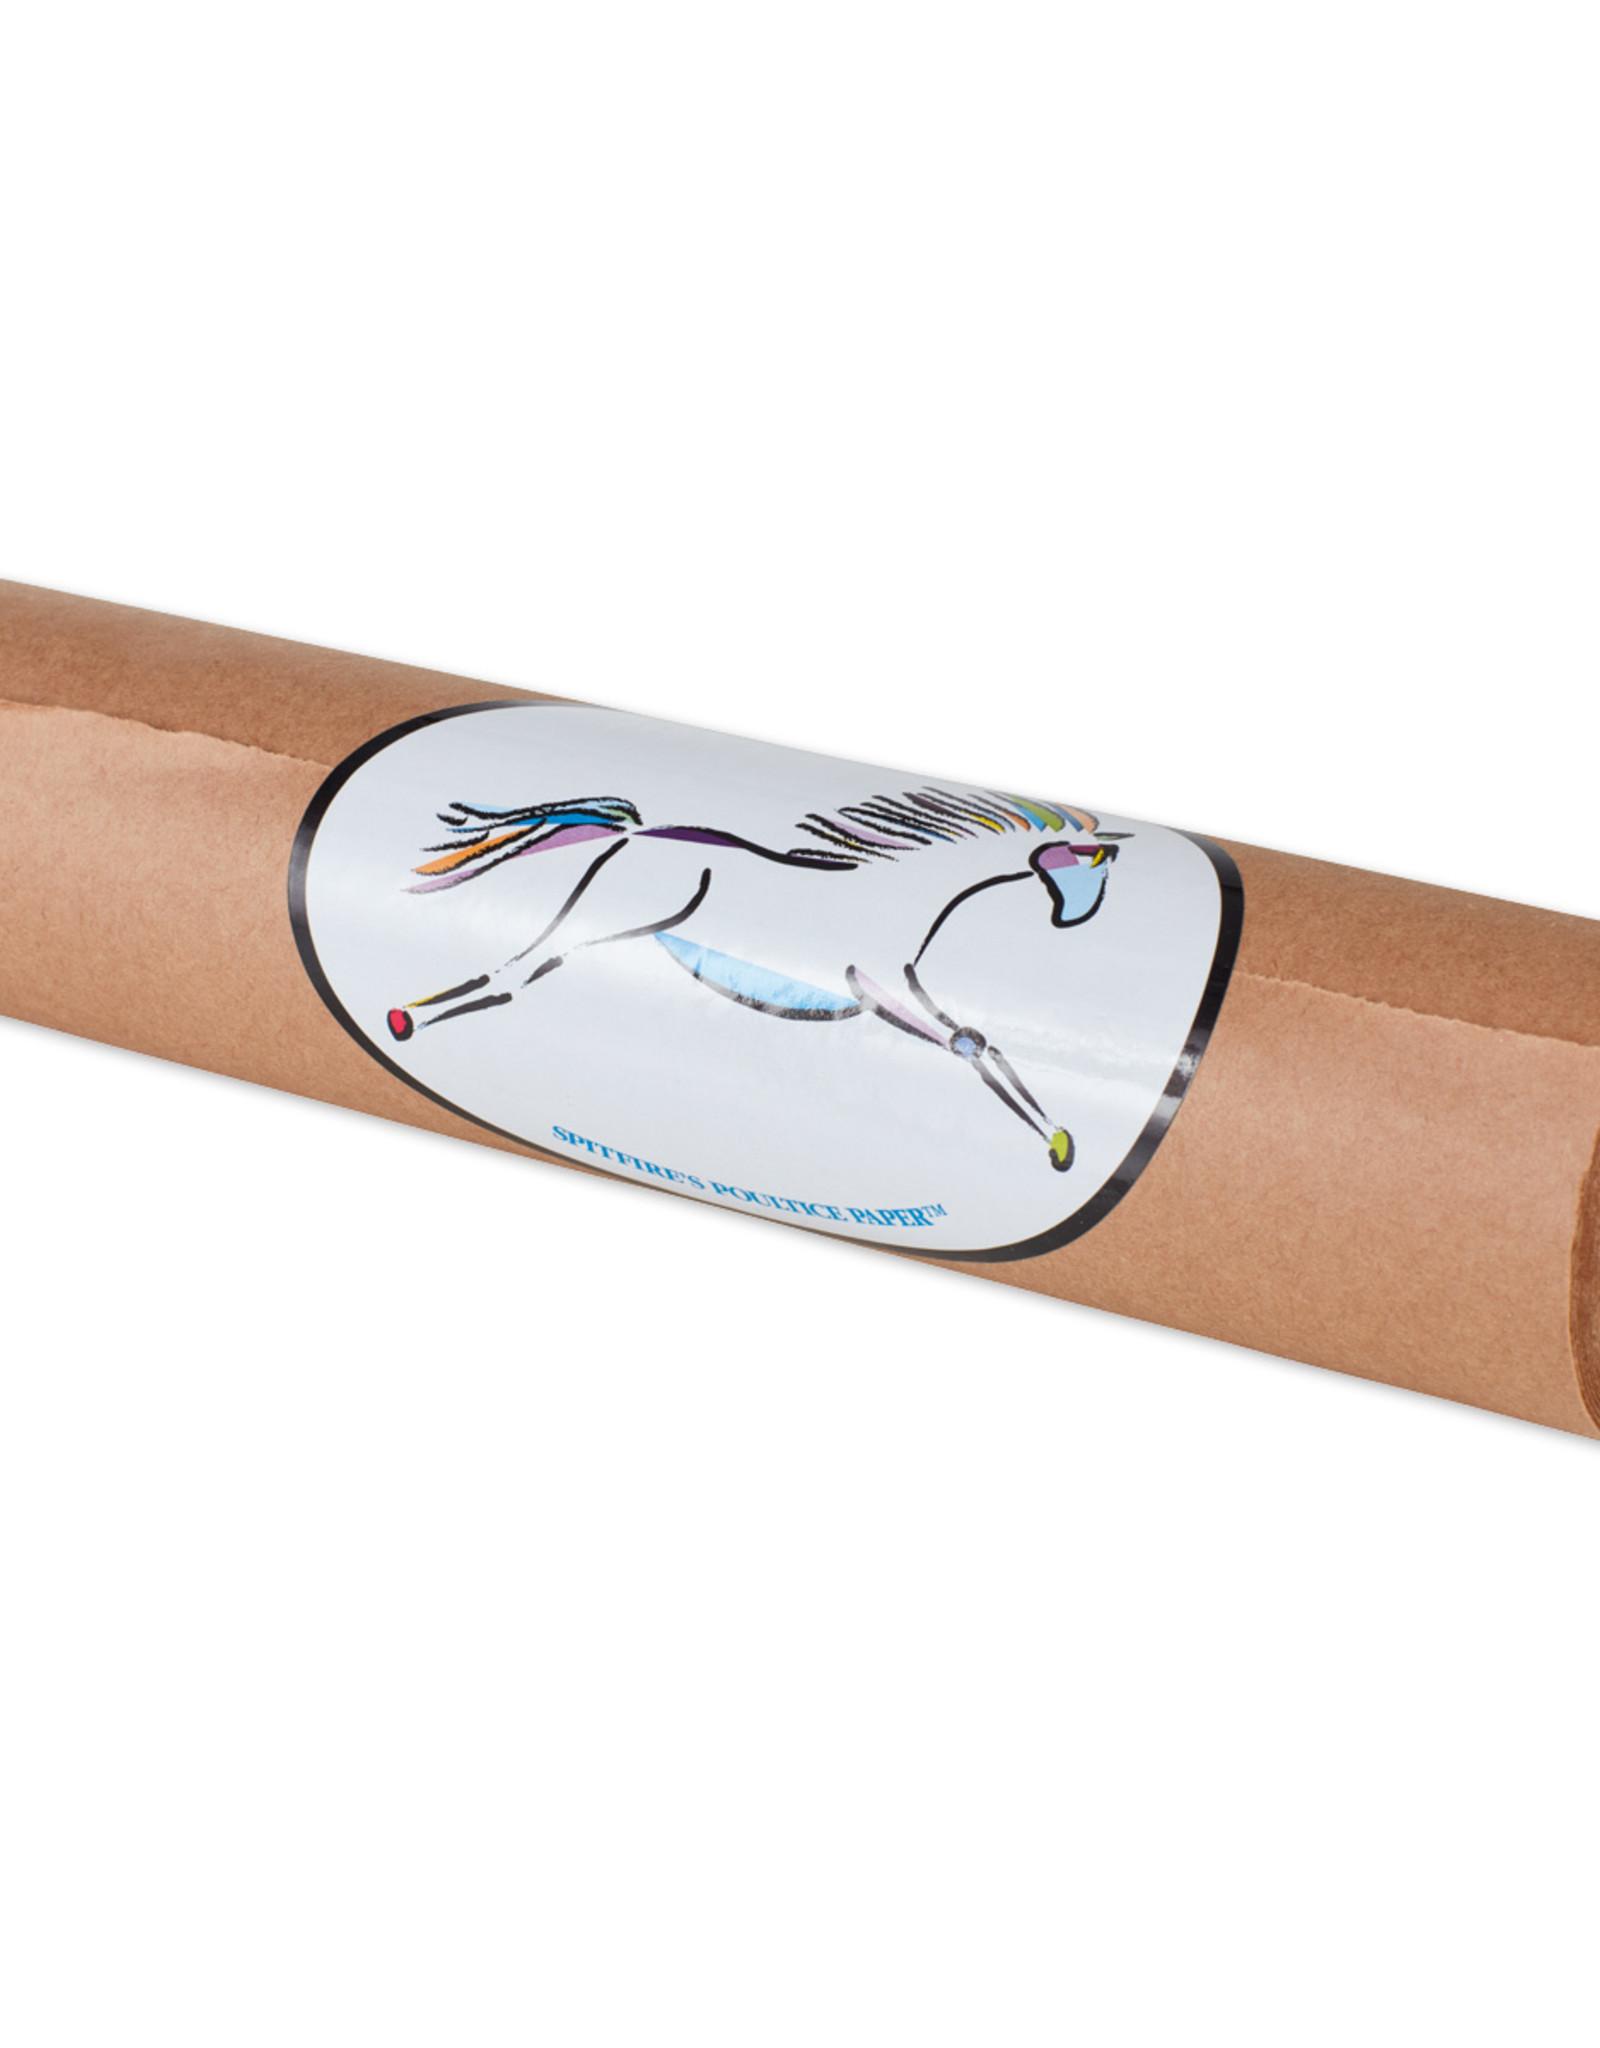 Spitfire's Poultice Paper Spitfire's Poultice Paper Roll